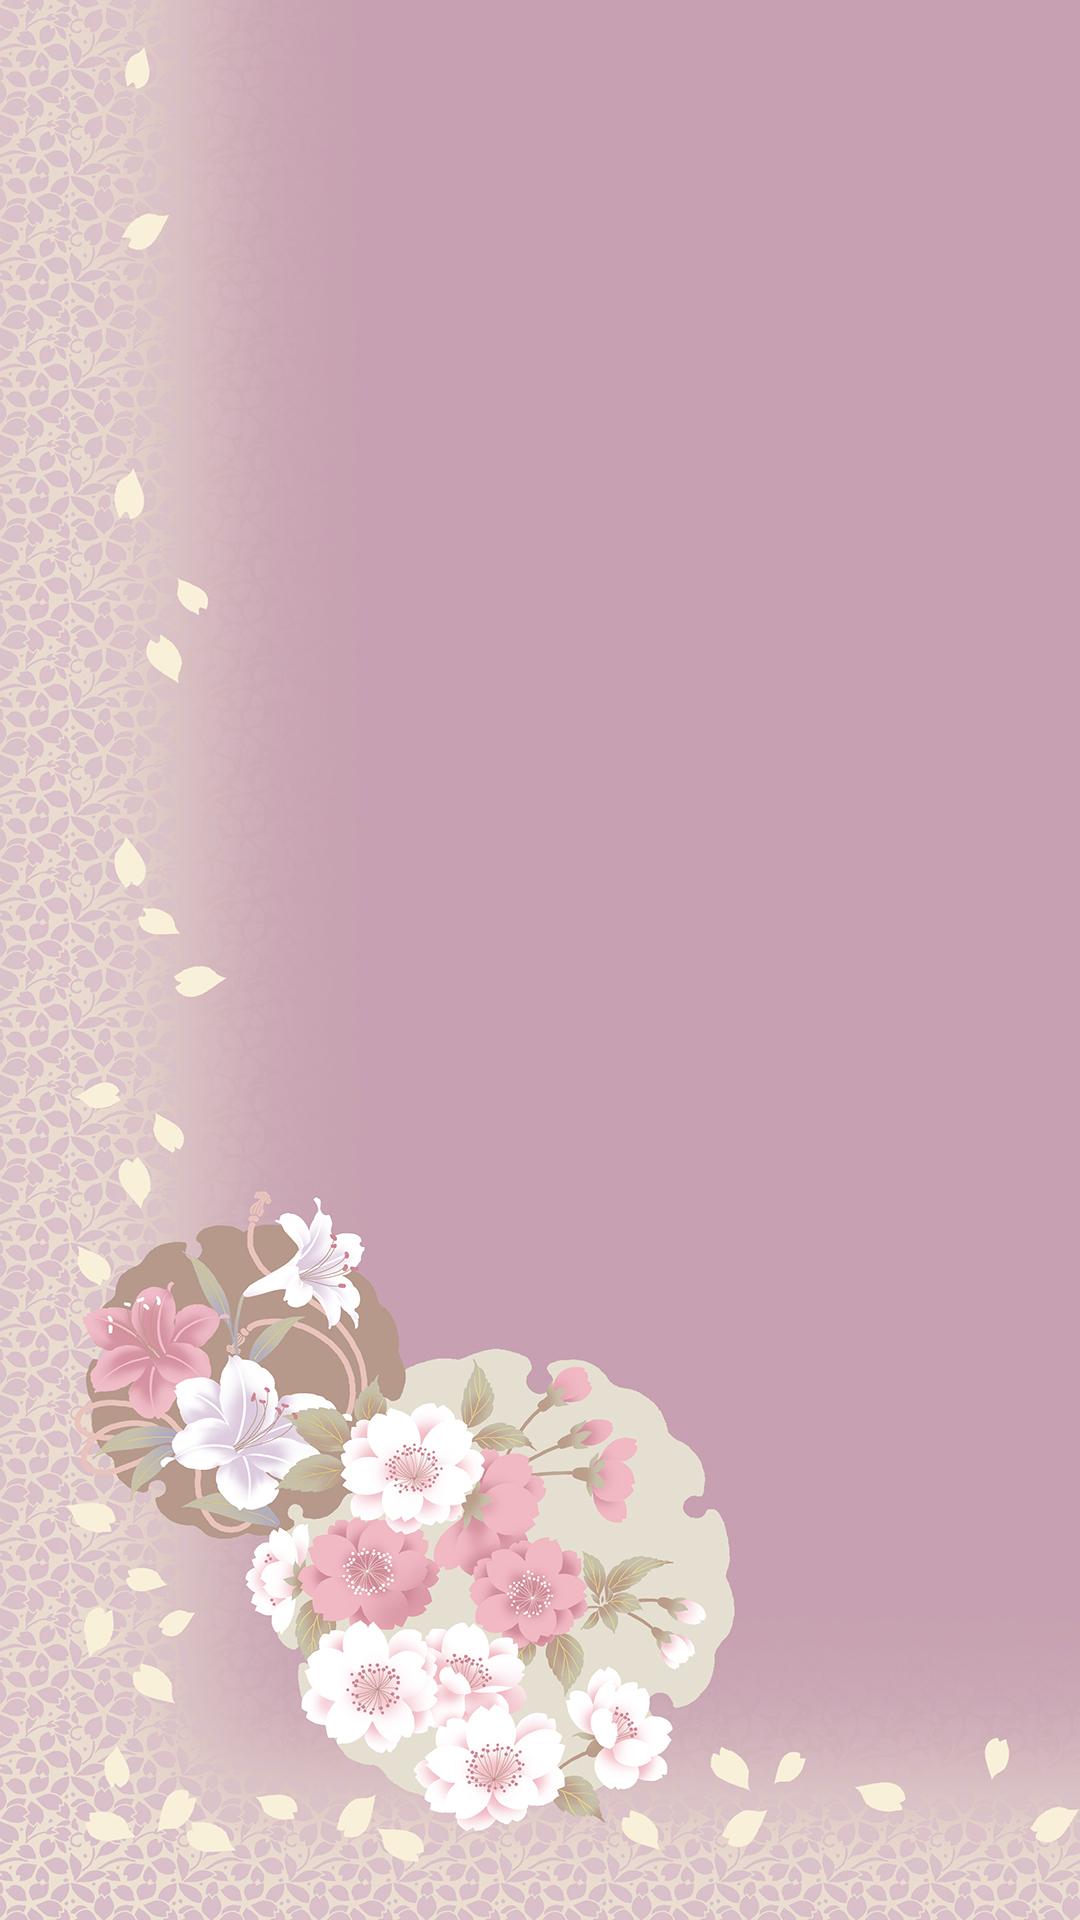 Elegant Pink White Flowers Border H5 Background Material